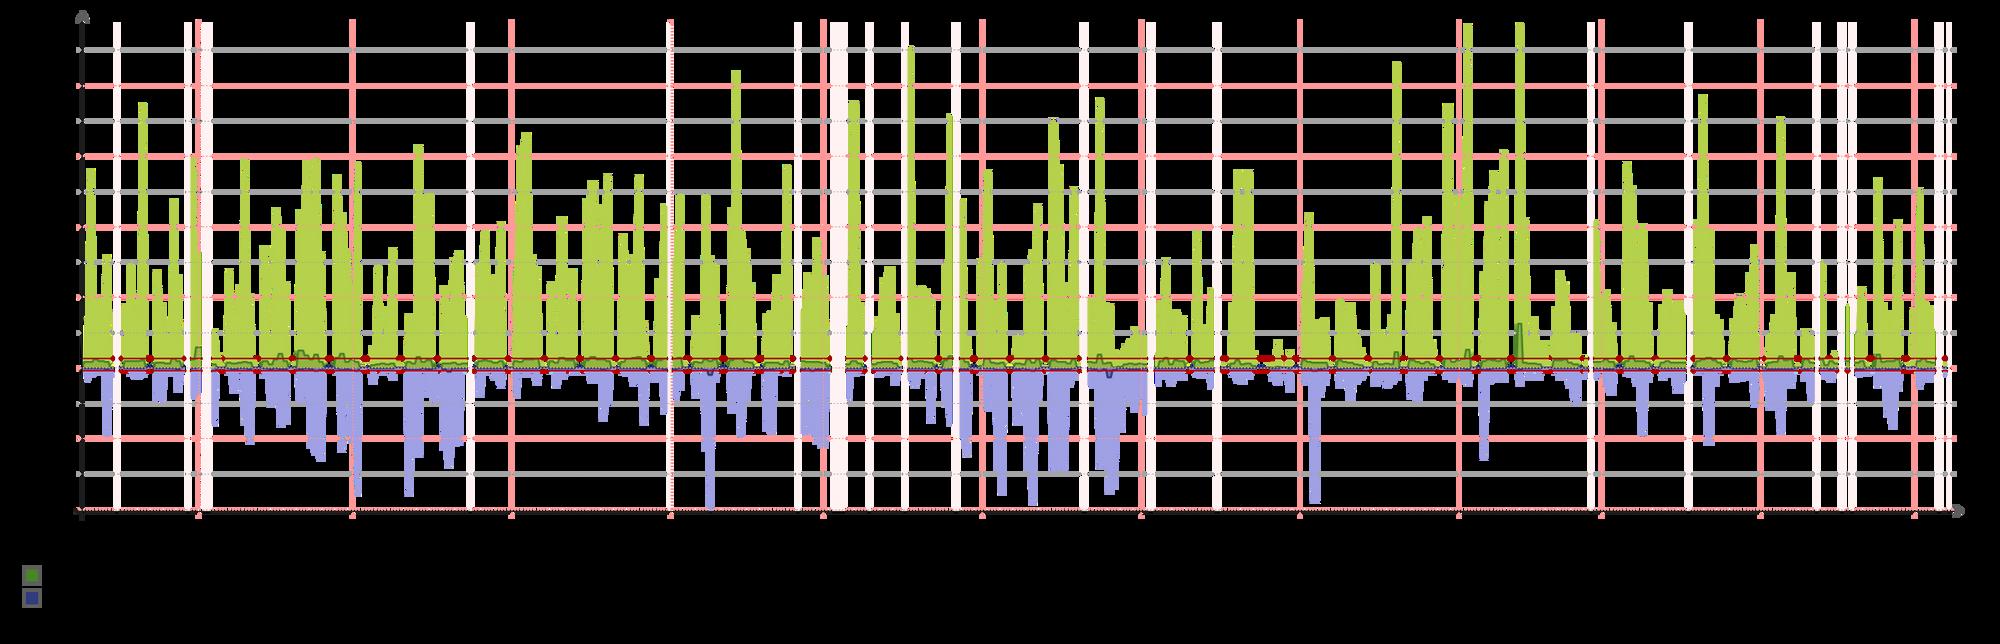 Windstream Modem Wiring Diagram   Wiring Library